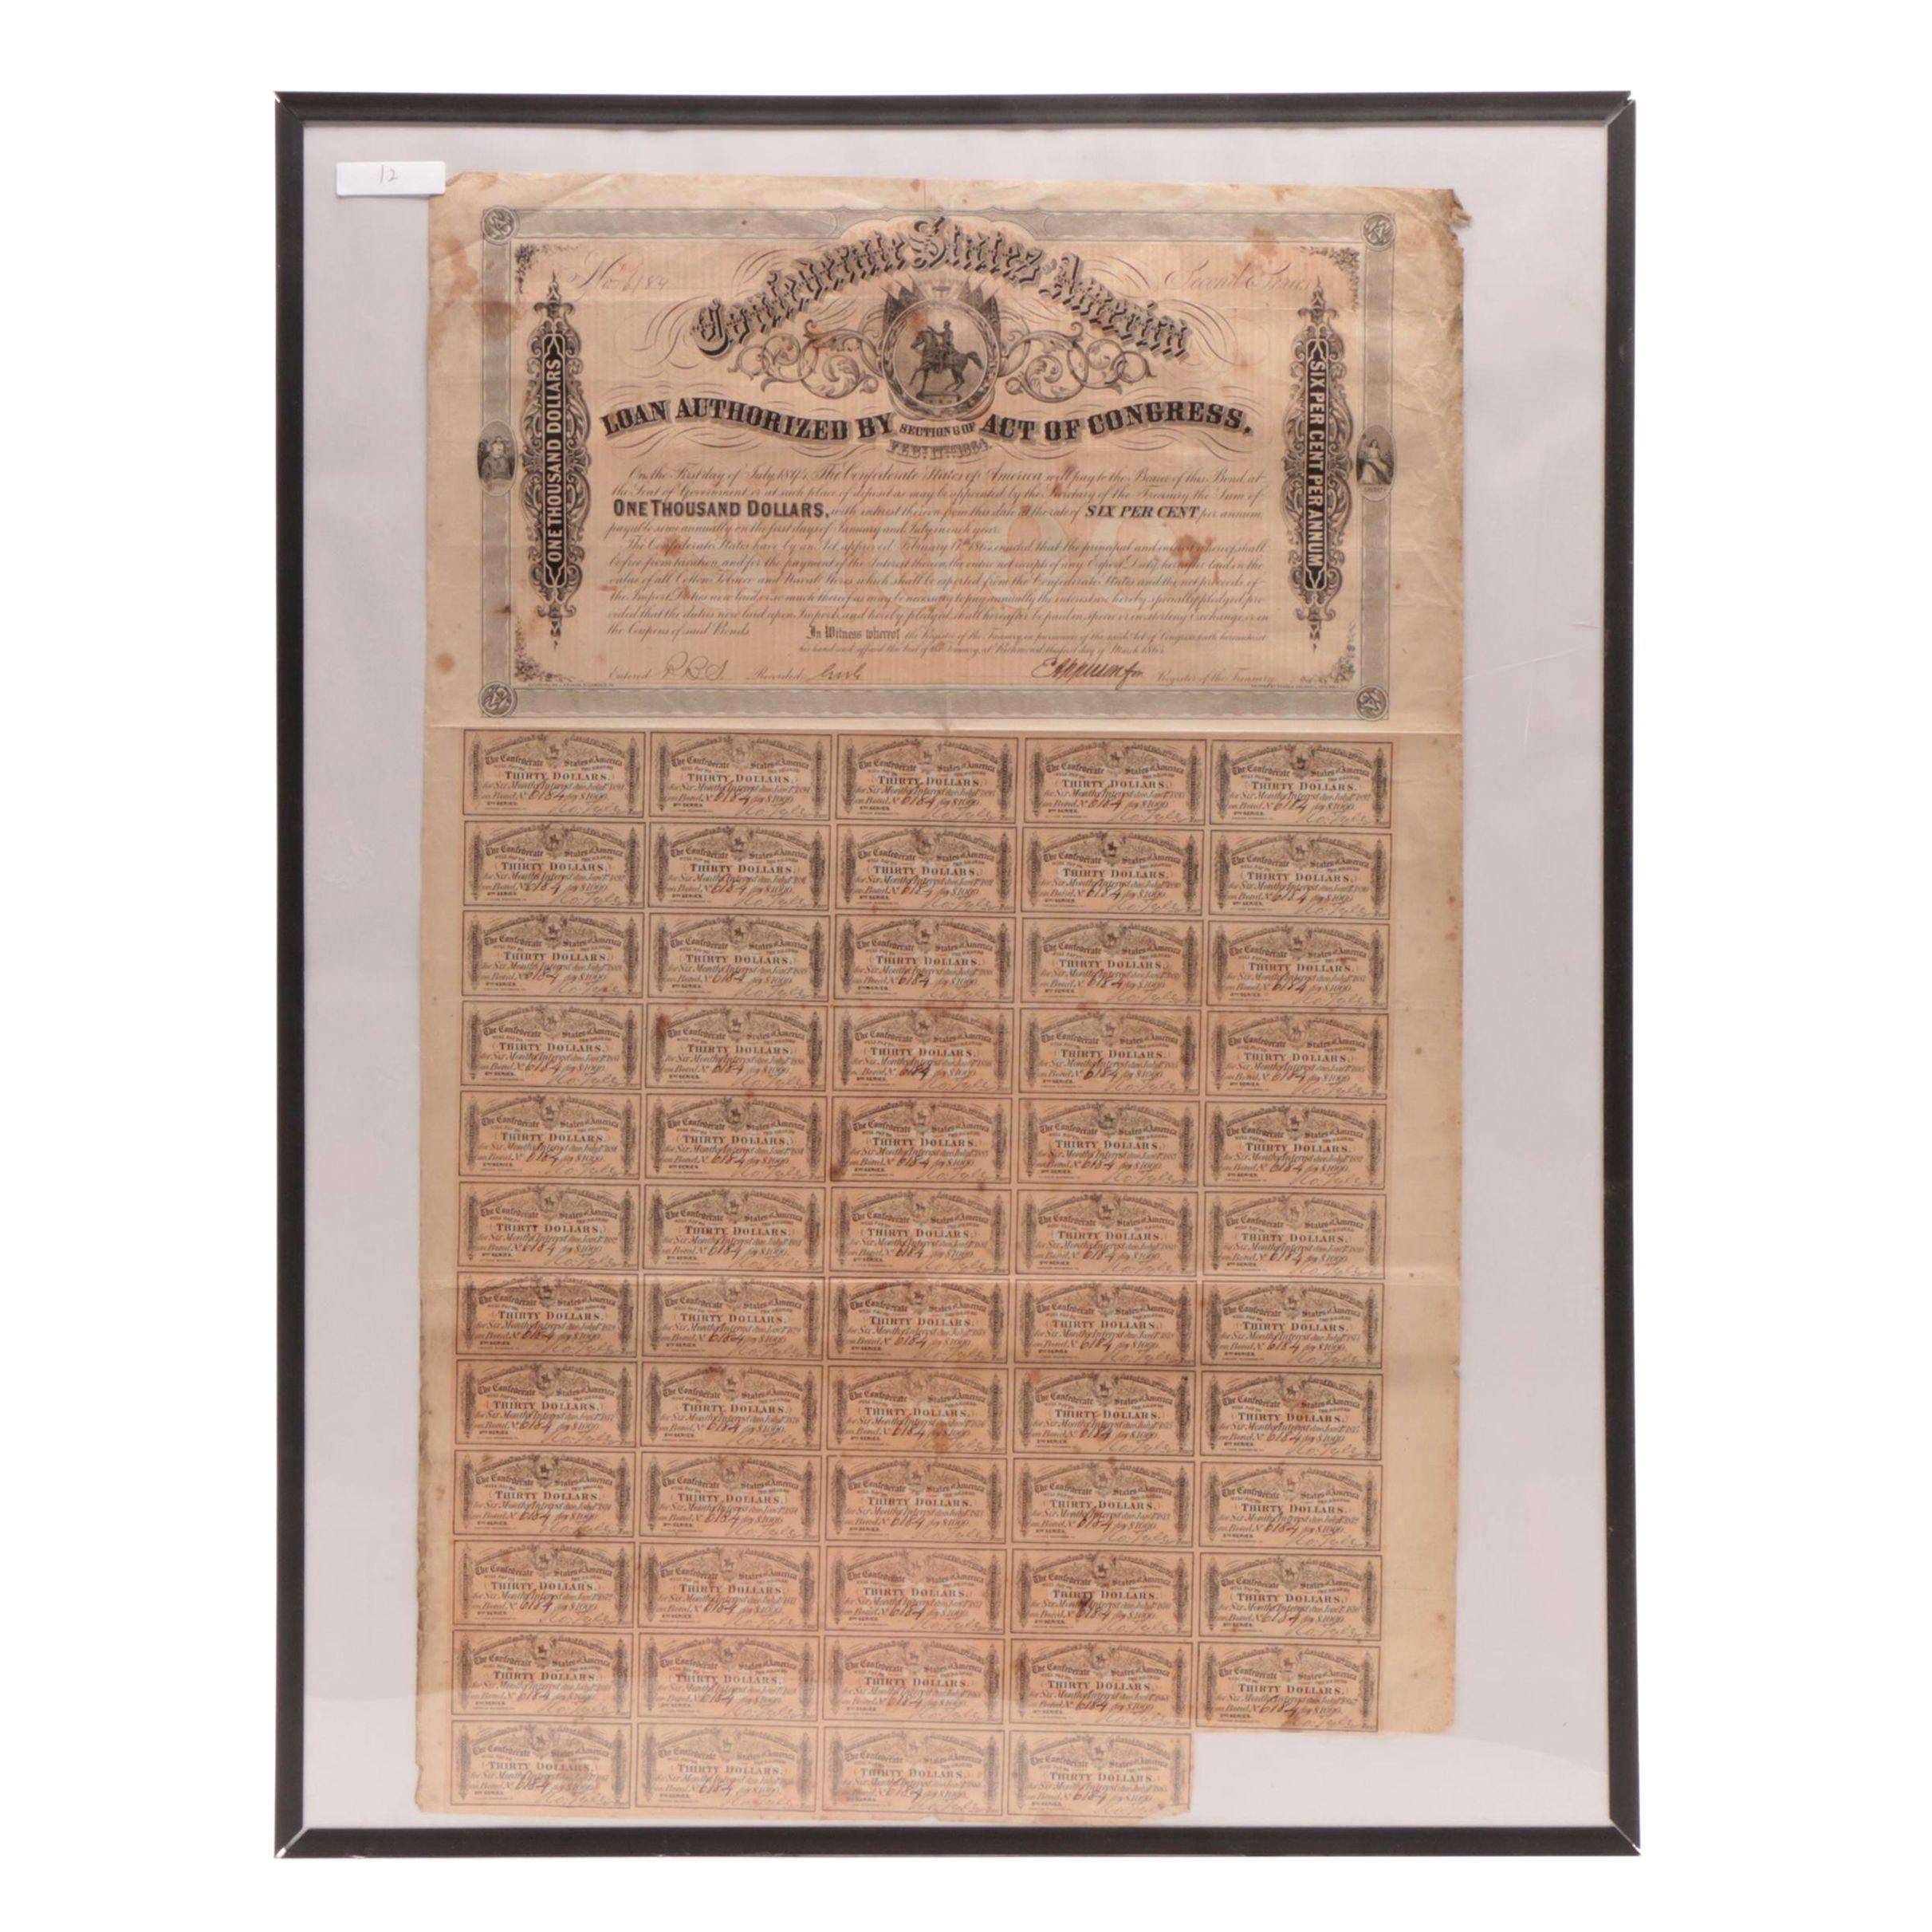 Confederate States of America Richmond, VA. Bond Dated March 1st, 1864